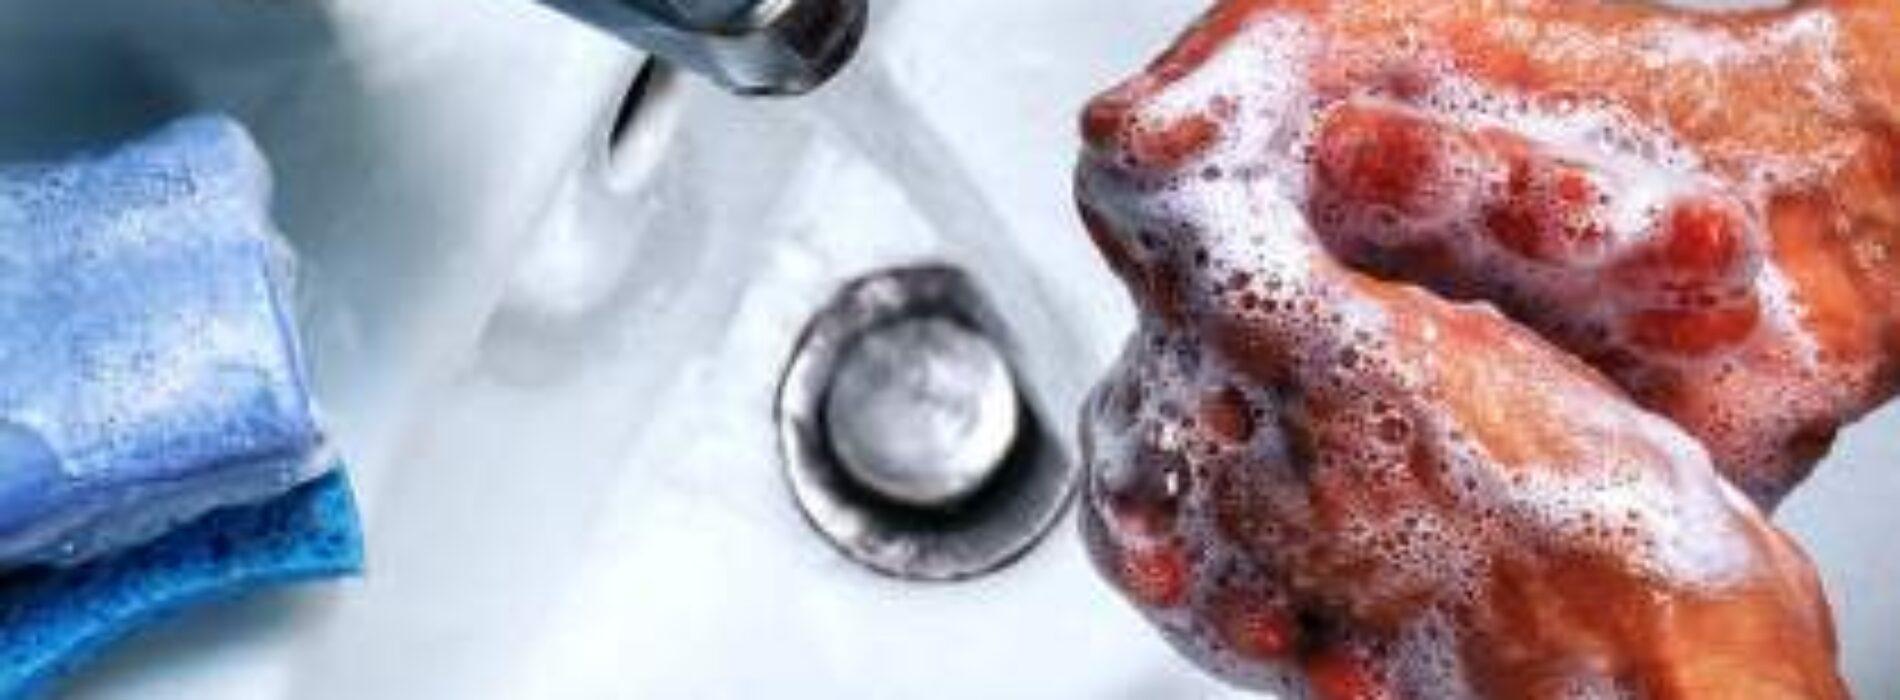 Global Handwashing Day: 3 in 5 Nigerians lack basic facilities at home – UNICEF